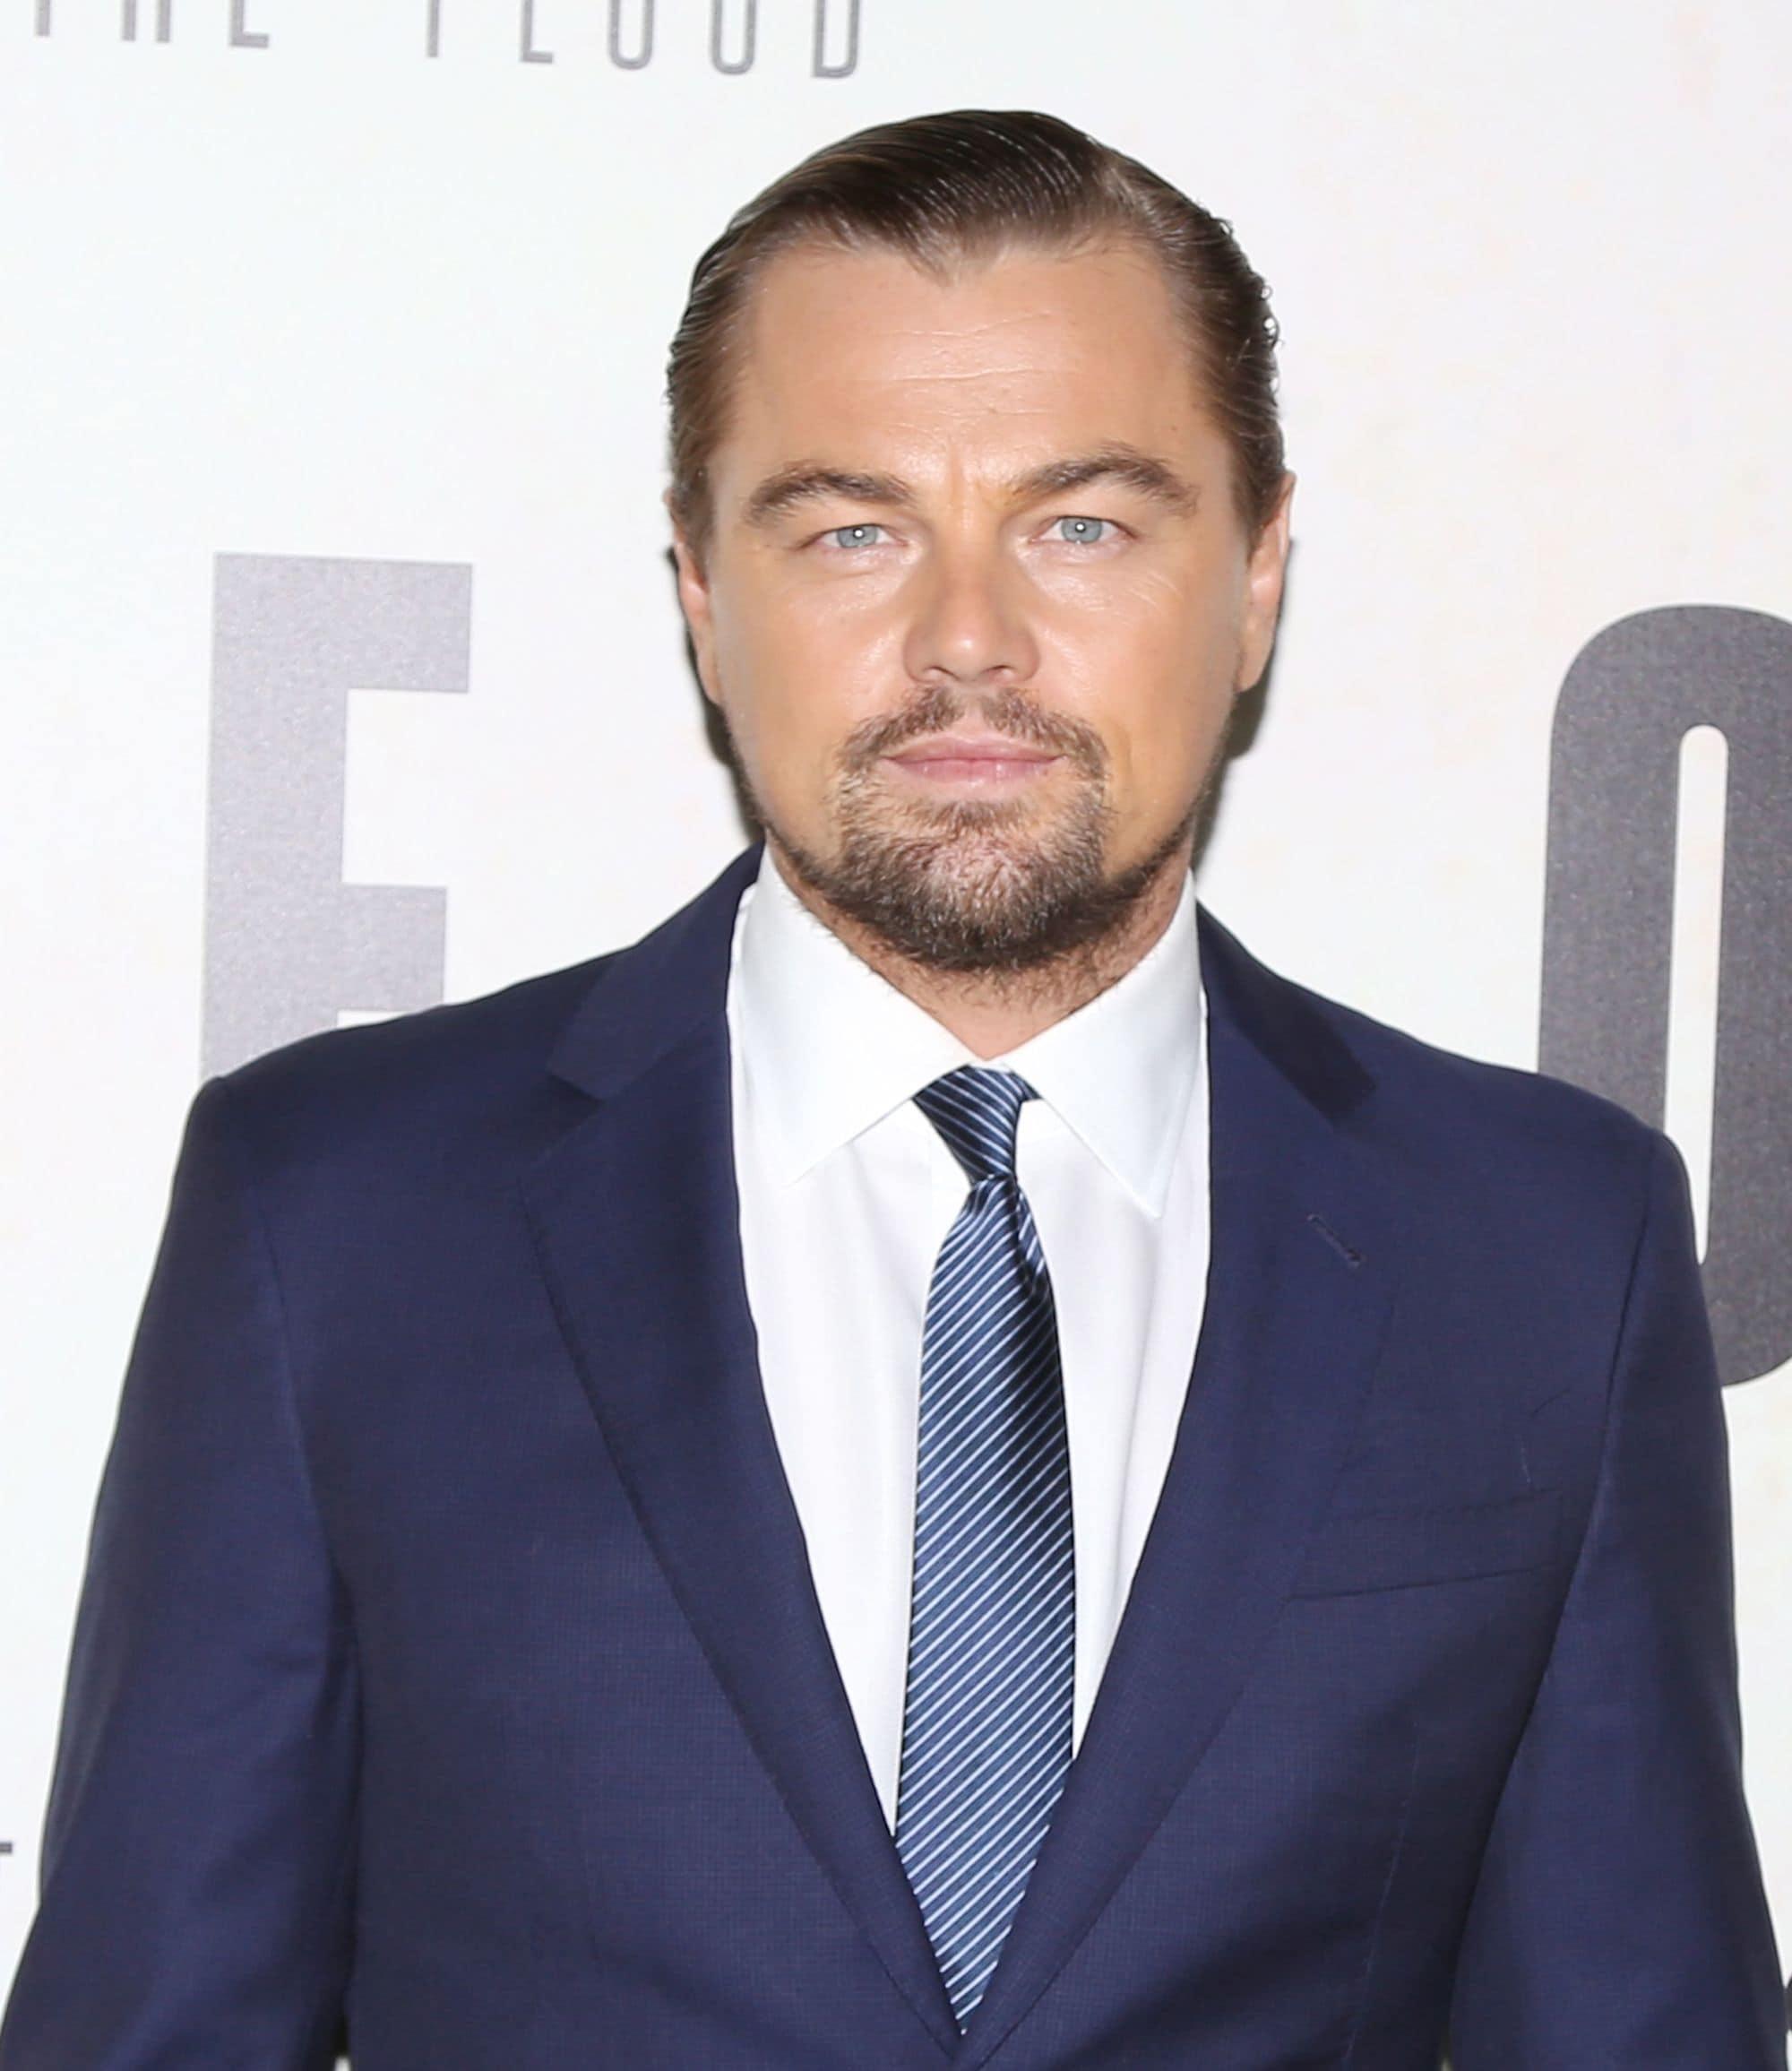 Leonardo DiCaprio wet look slicked back hair